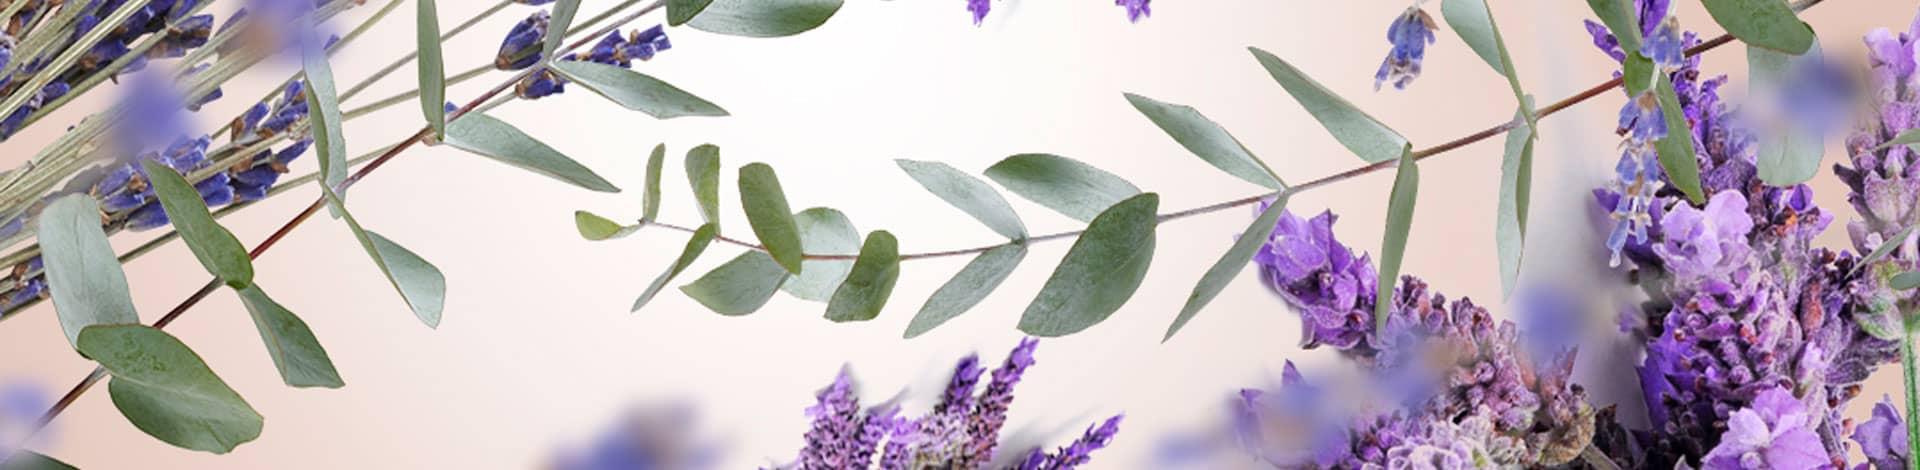 Un campo de Lavanda freca aroma floral